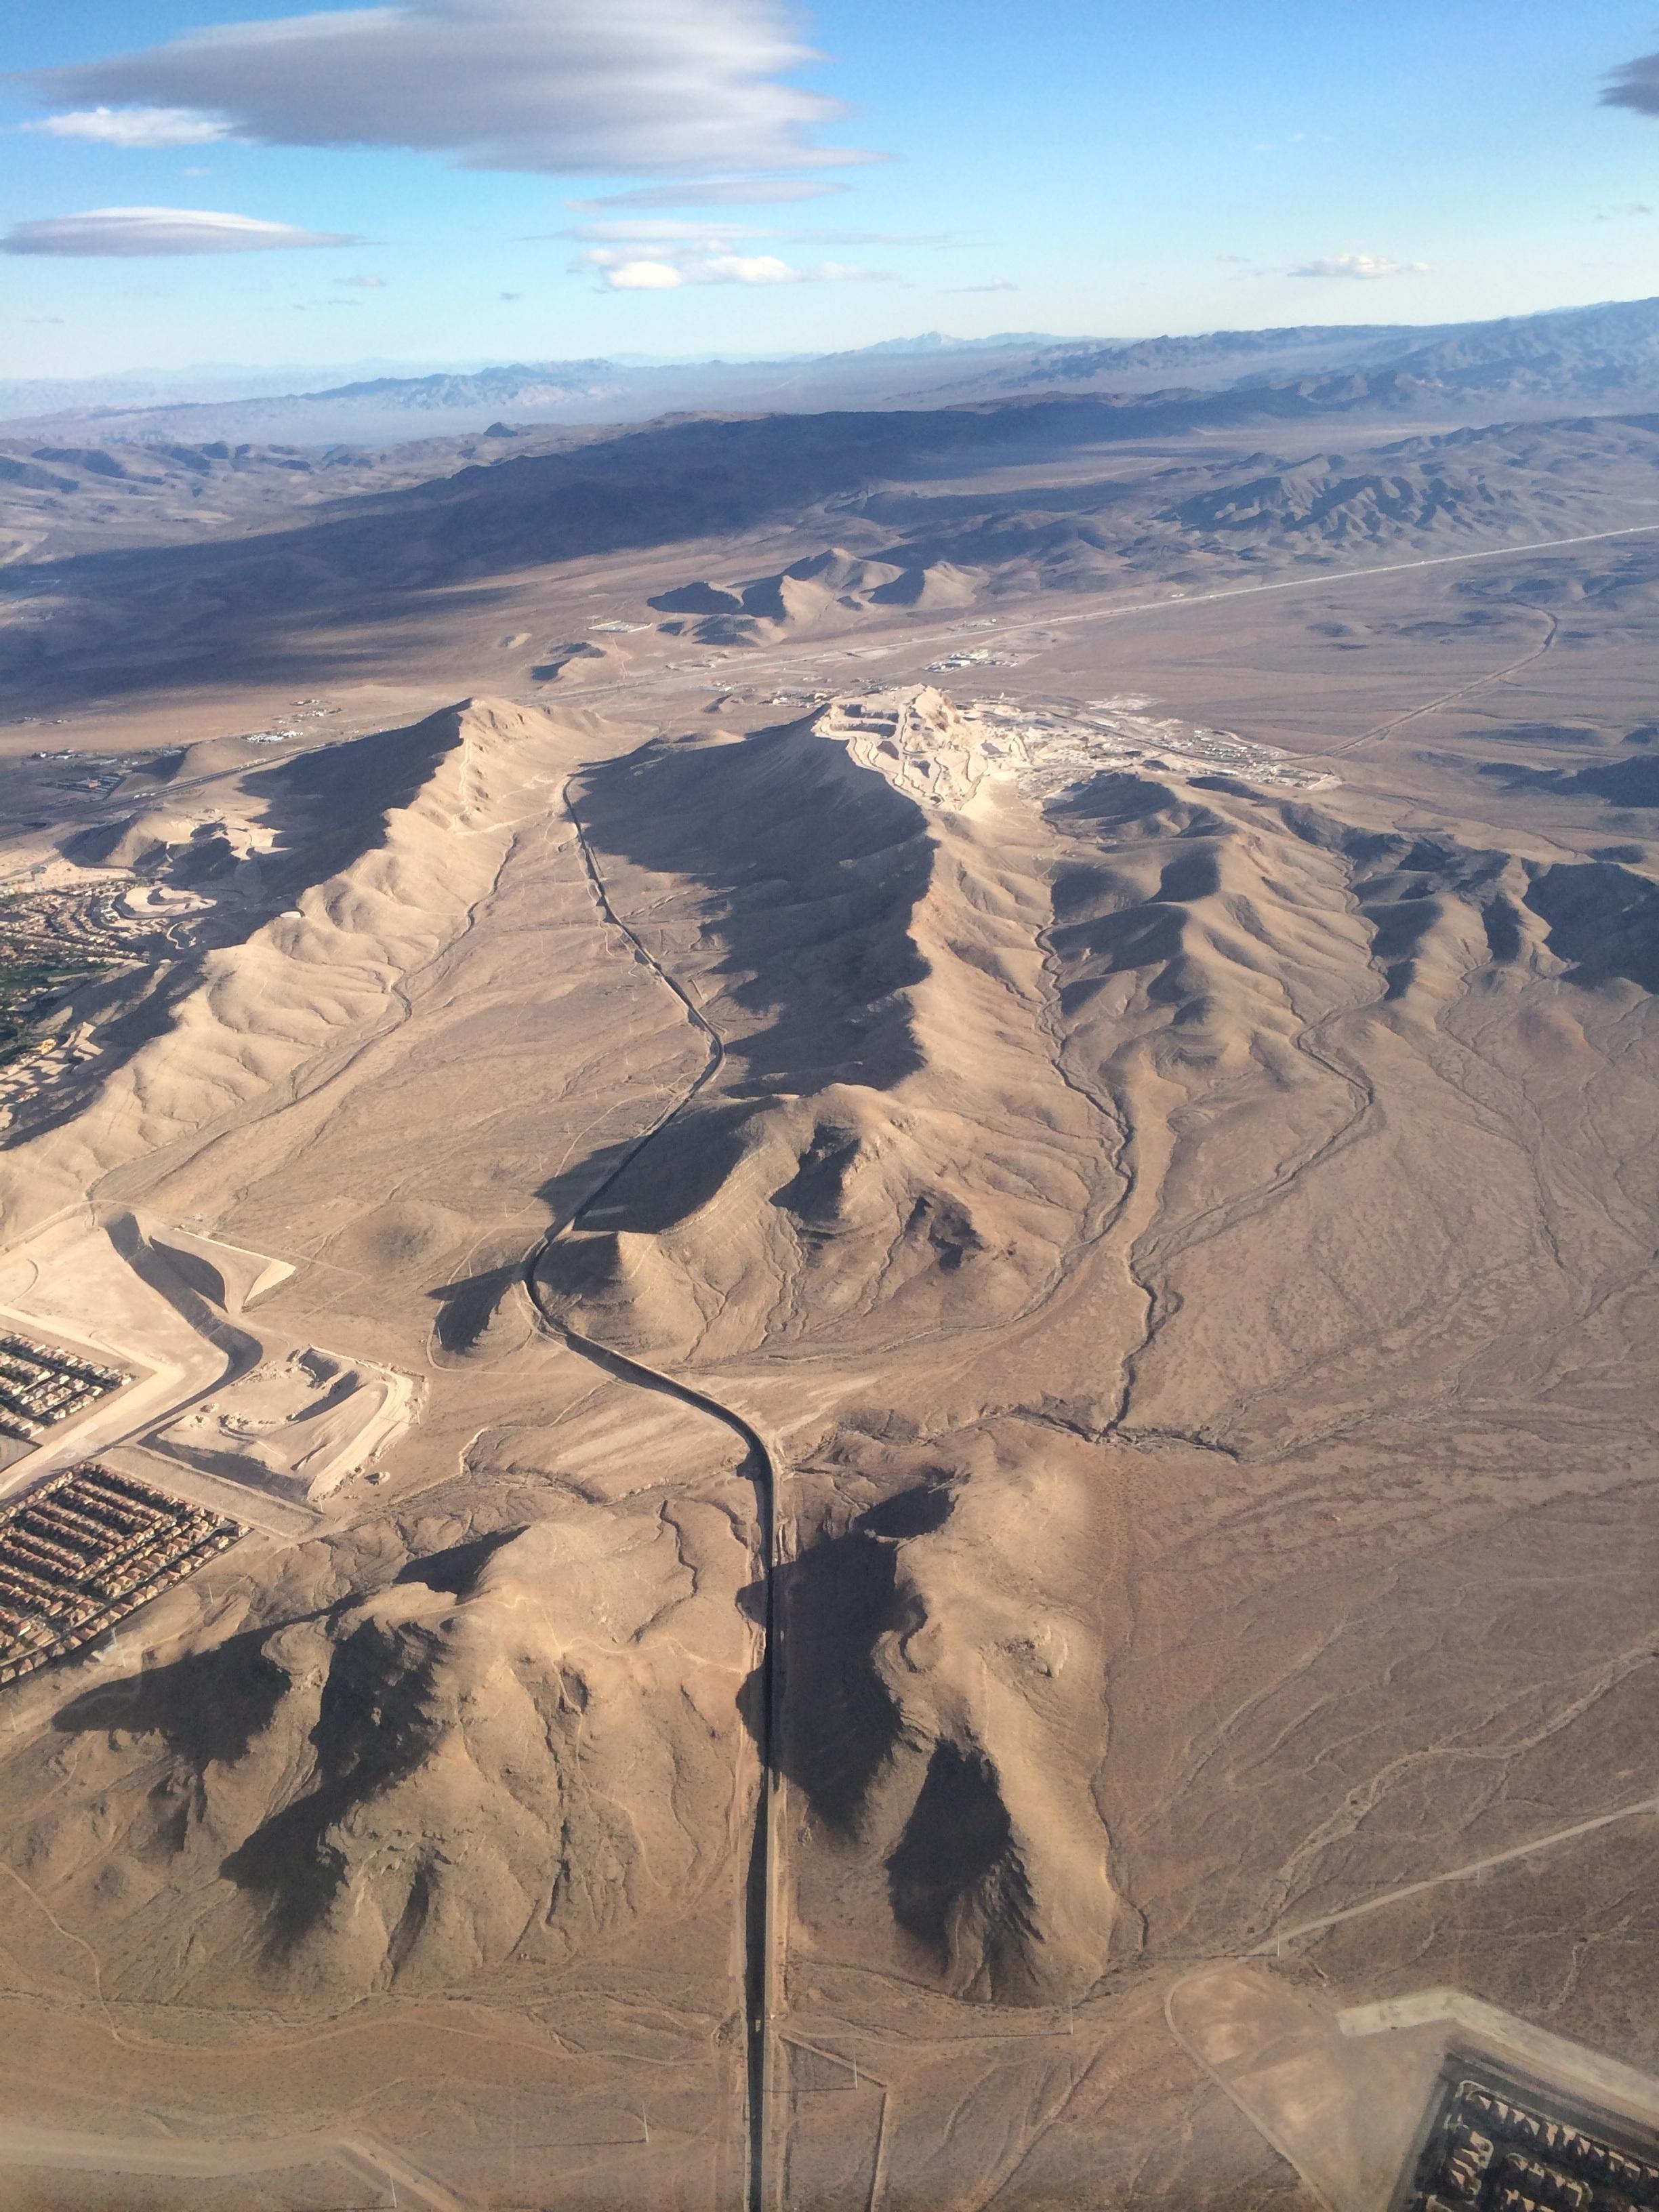 Fotos Gratis Paisaje Montana Desierto Valle